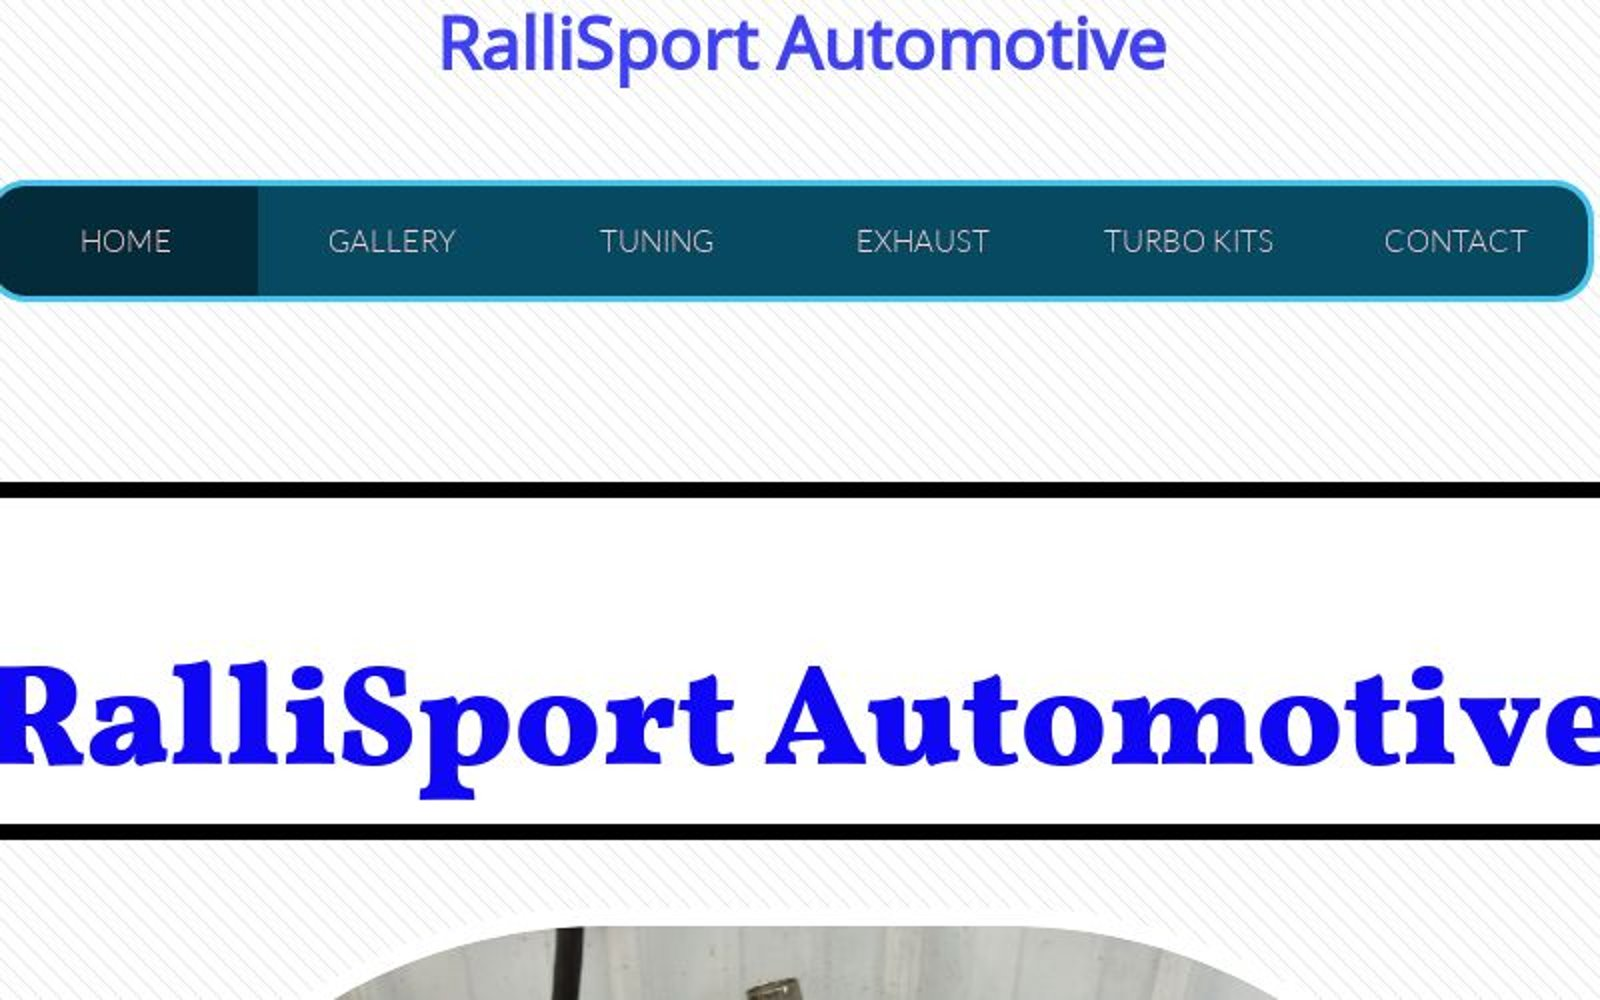 rallisportautomotive.com